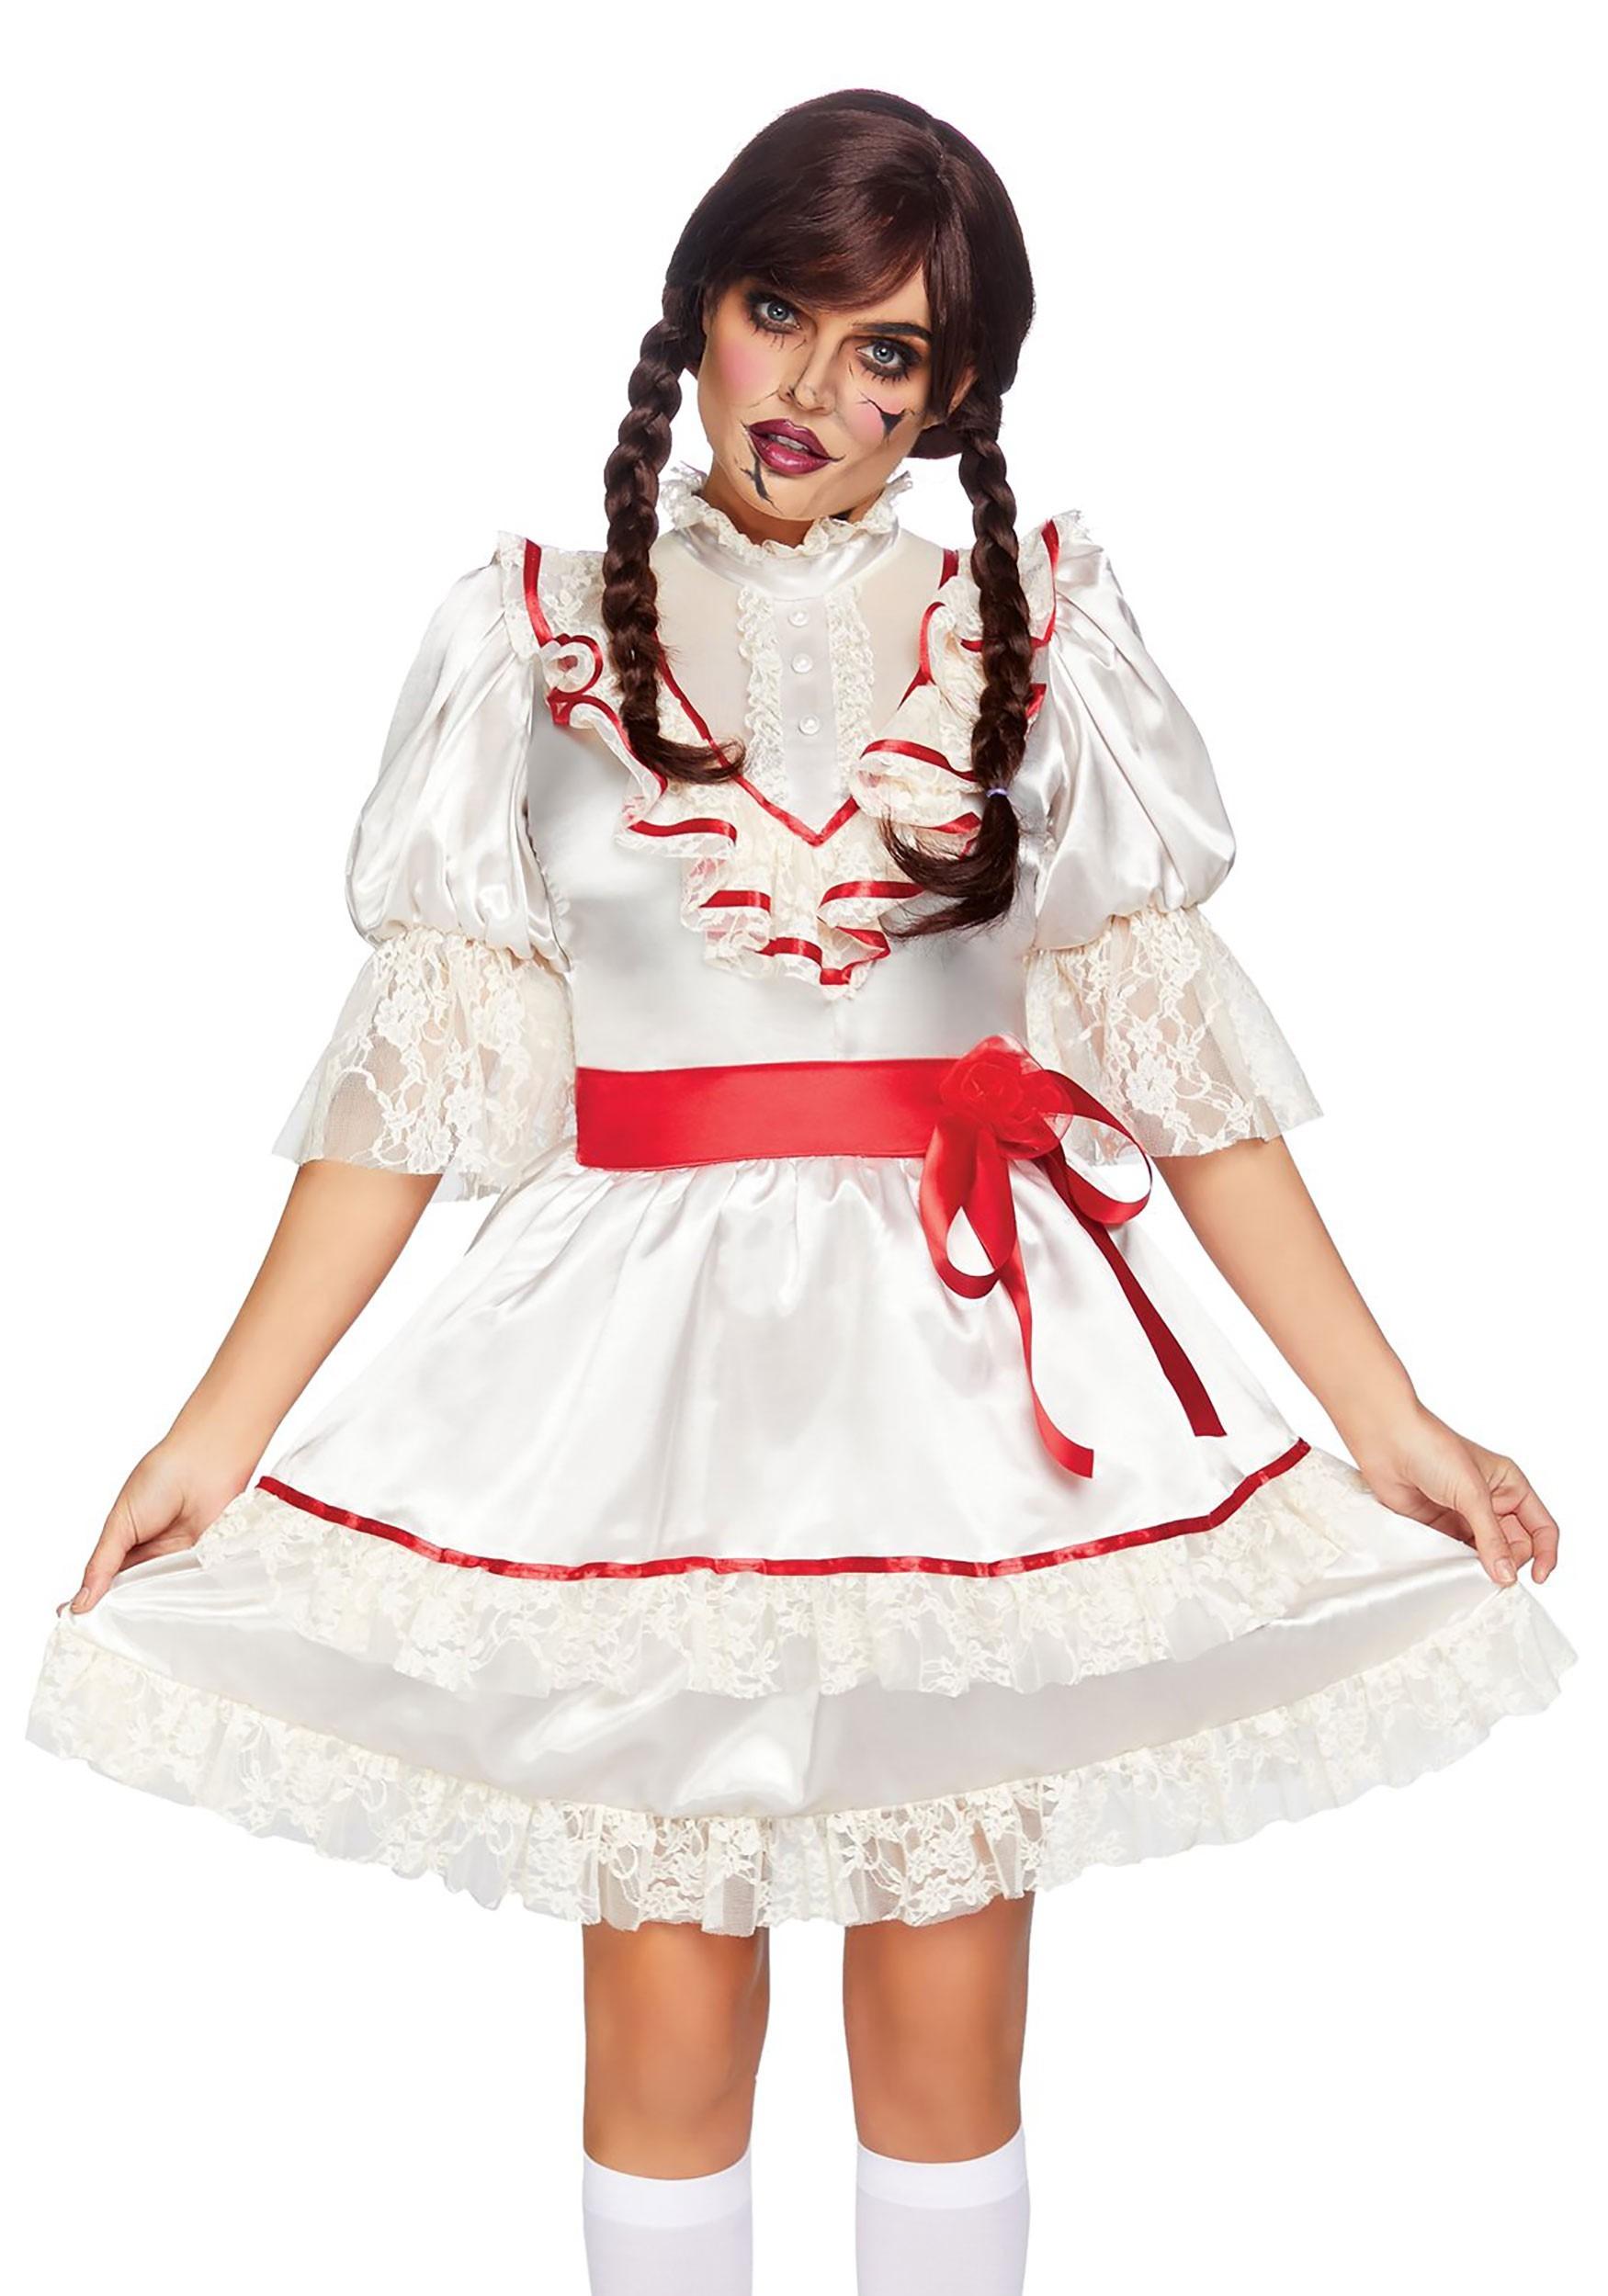 Haunted Doll Dress Women's Costume